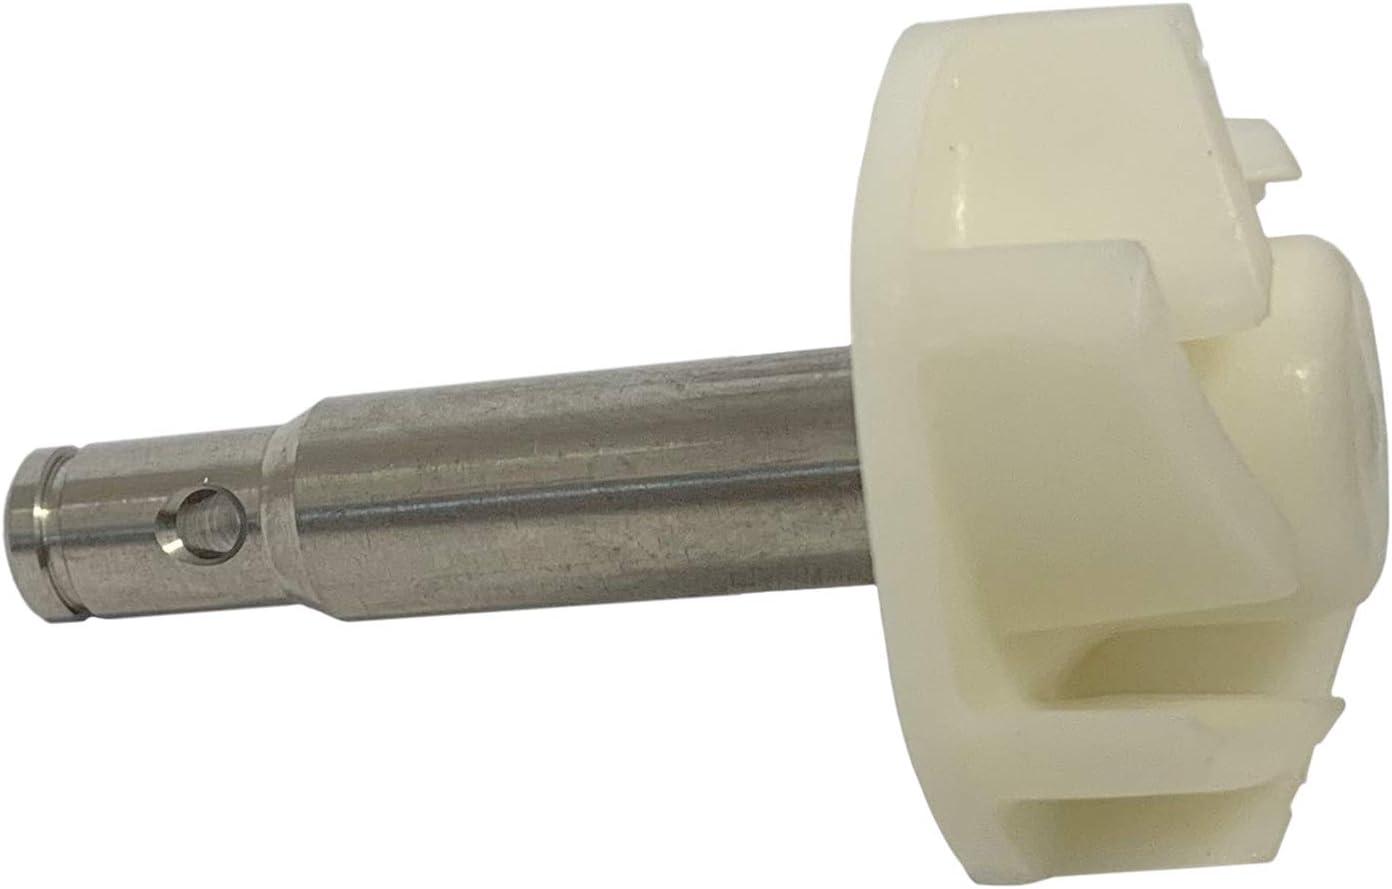 Factory Spec MX-10240B Water Pump 価格 交渉 送料無料 出色 Shaft With 1993-200 Impeller